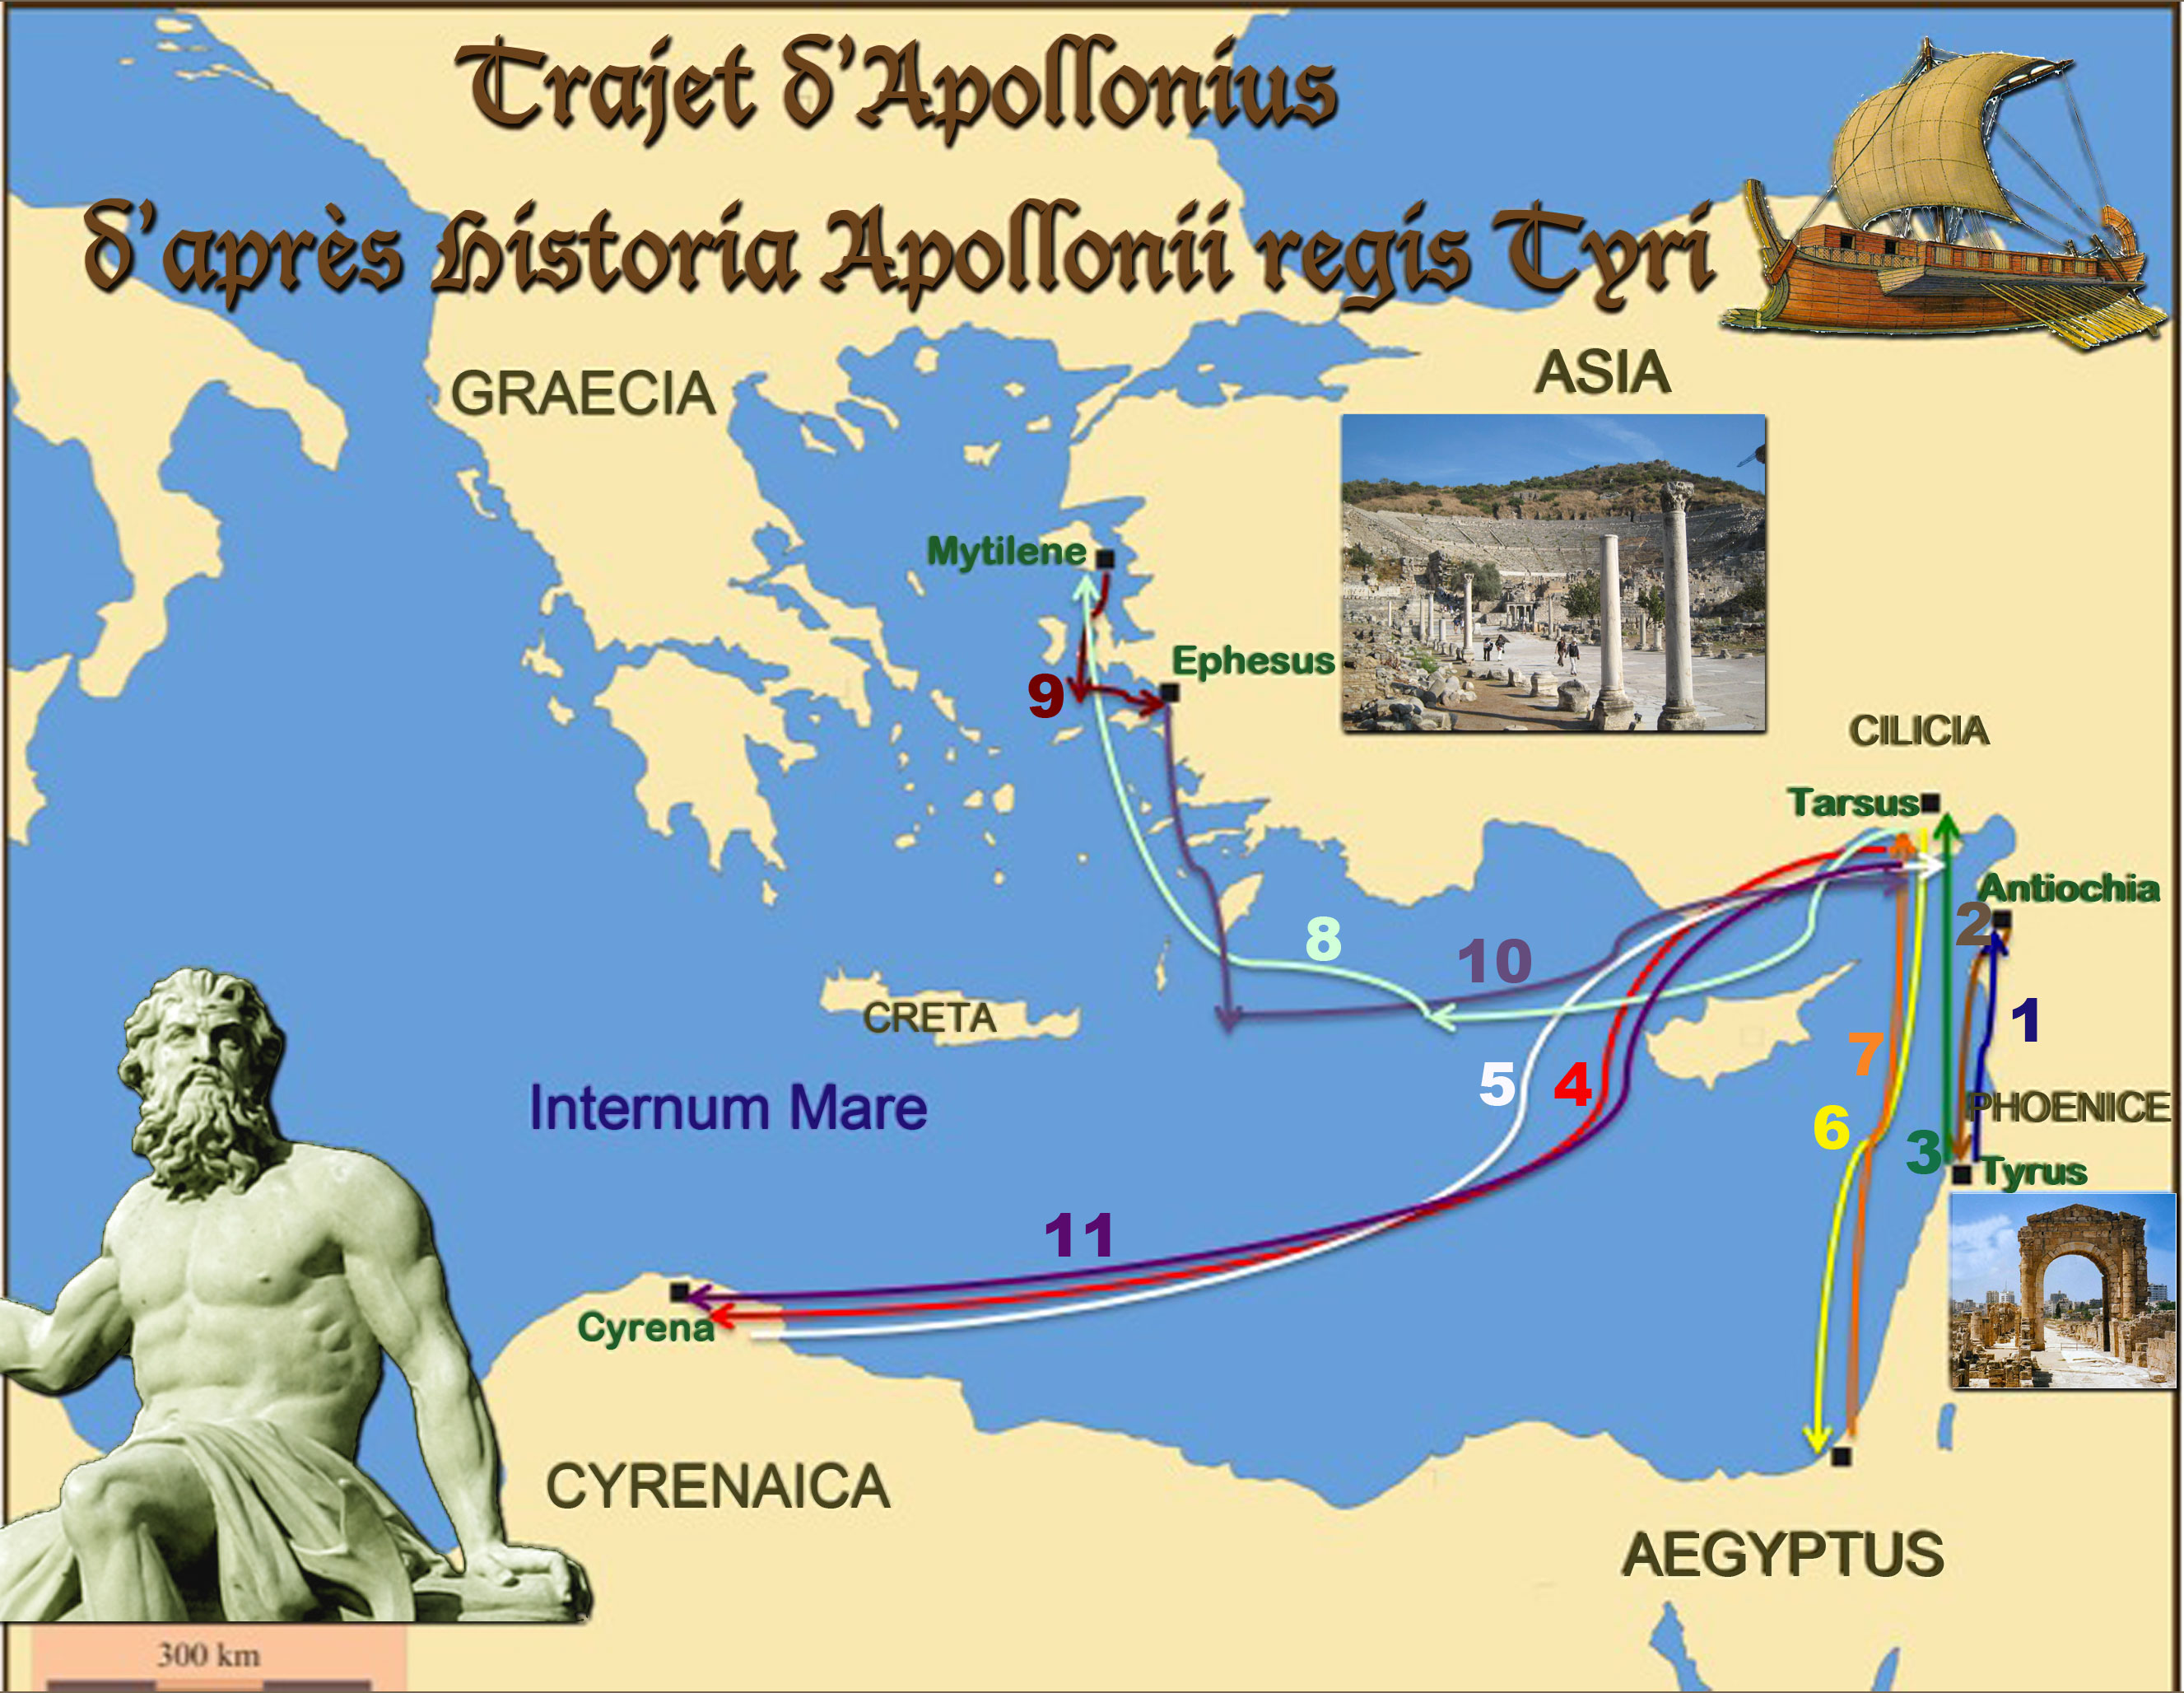 TrajetsApollonius01